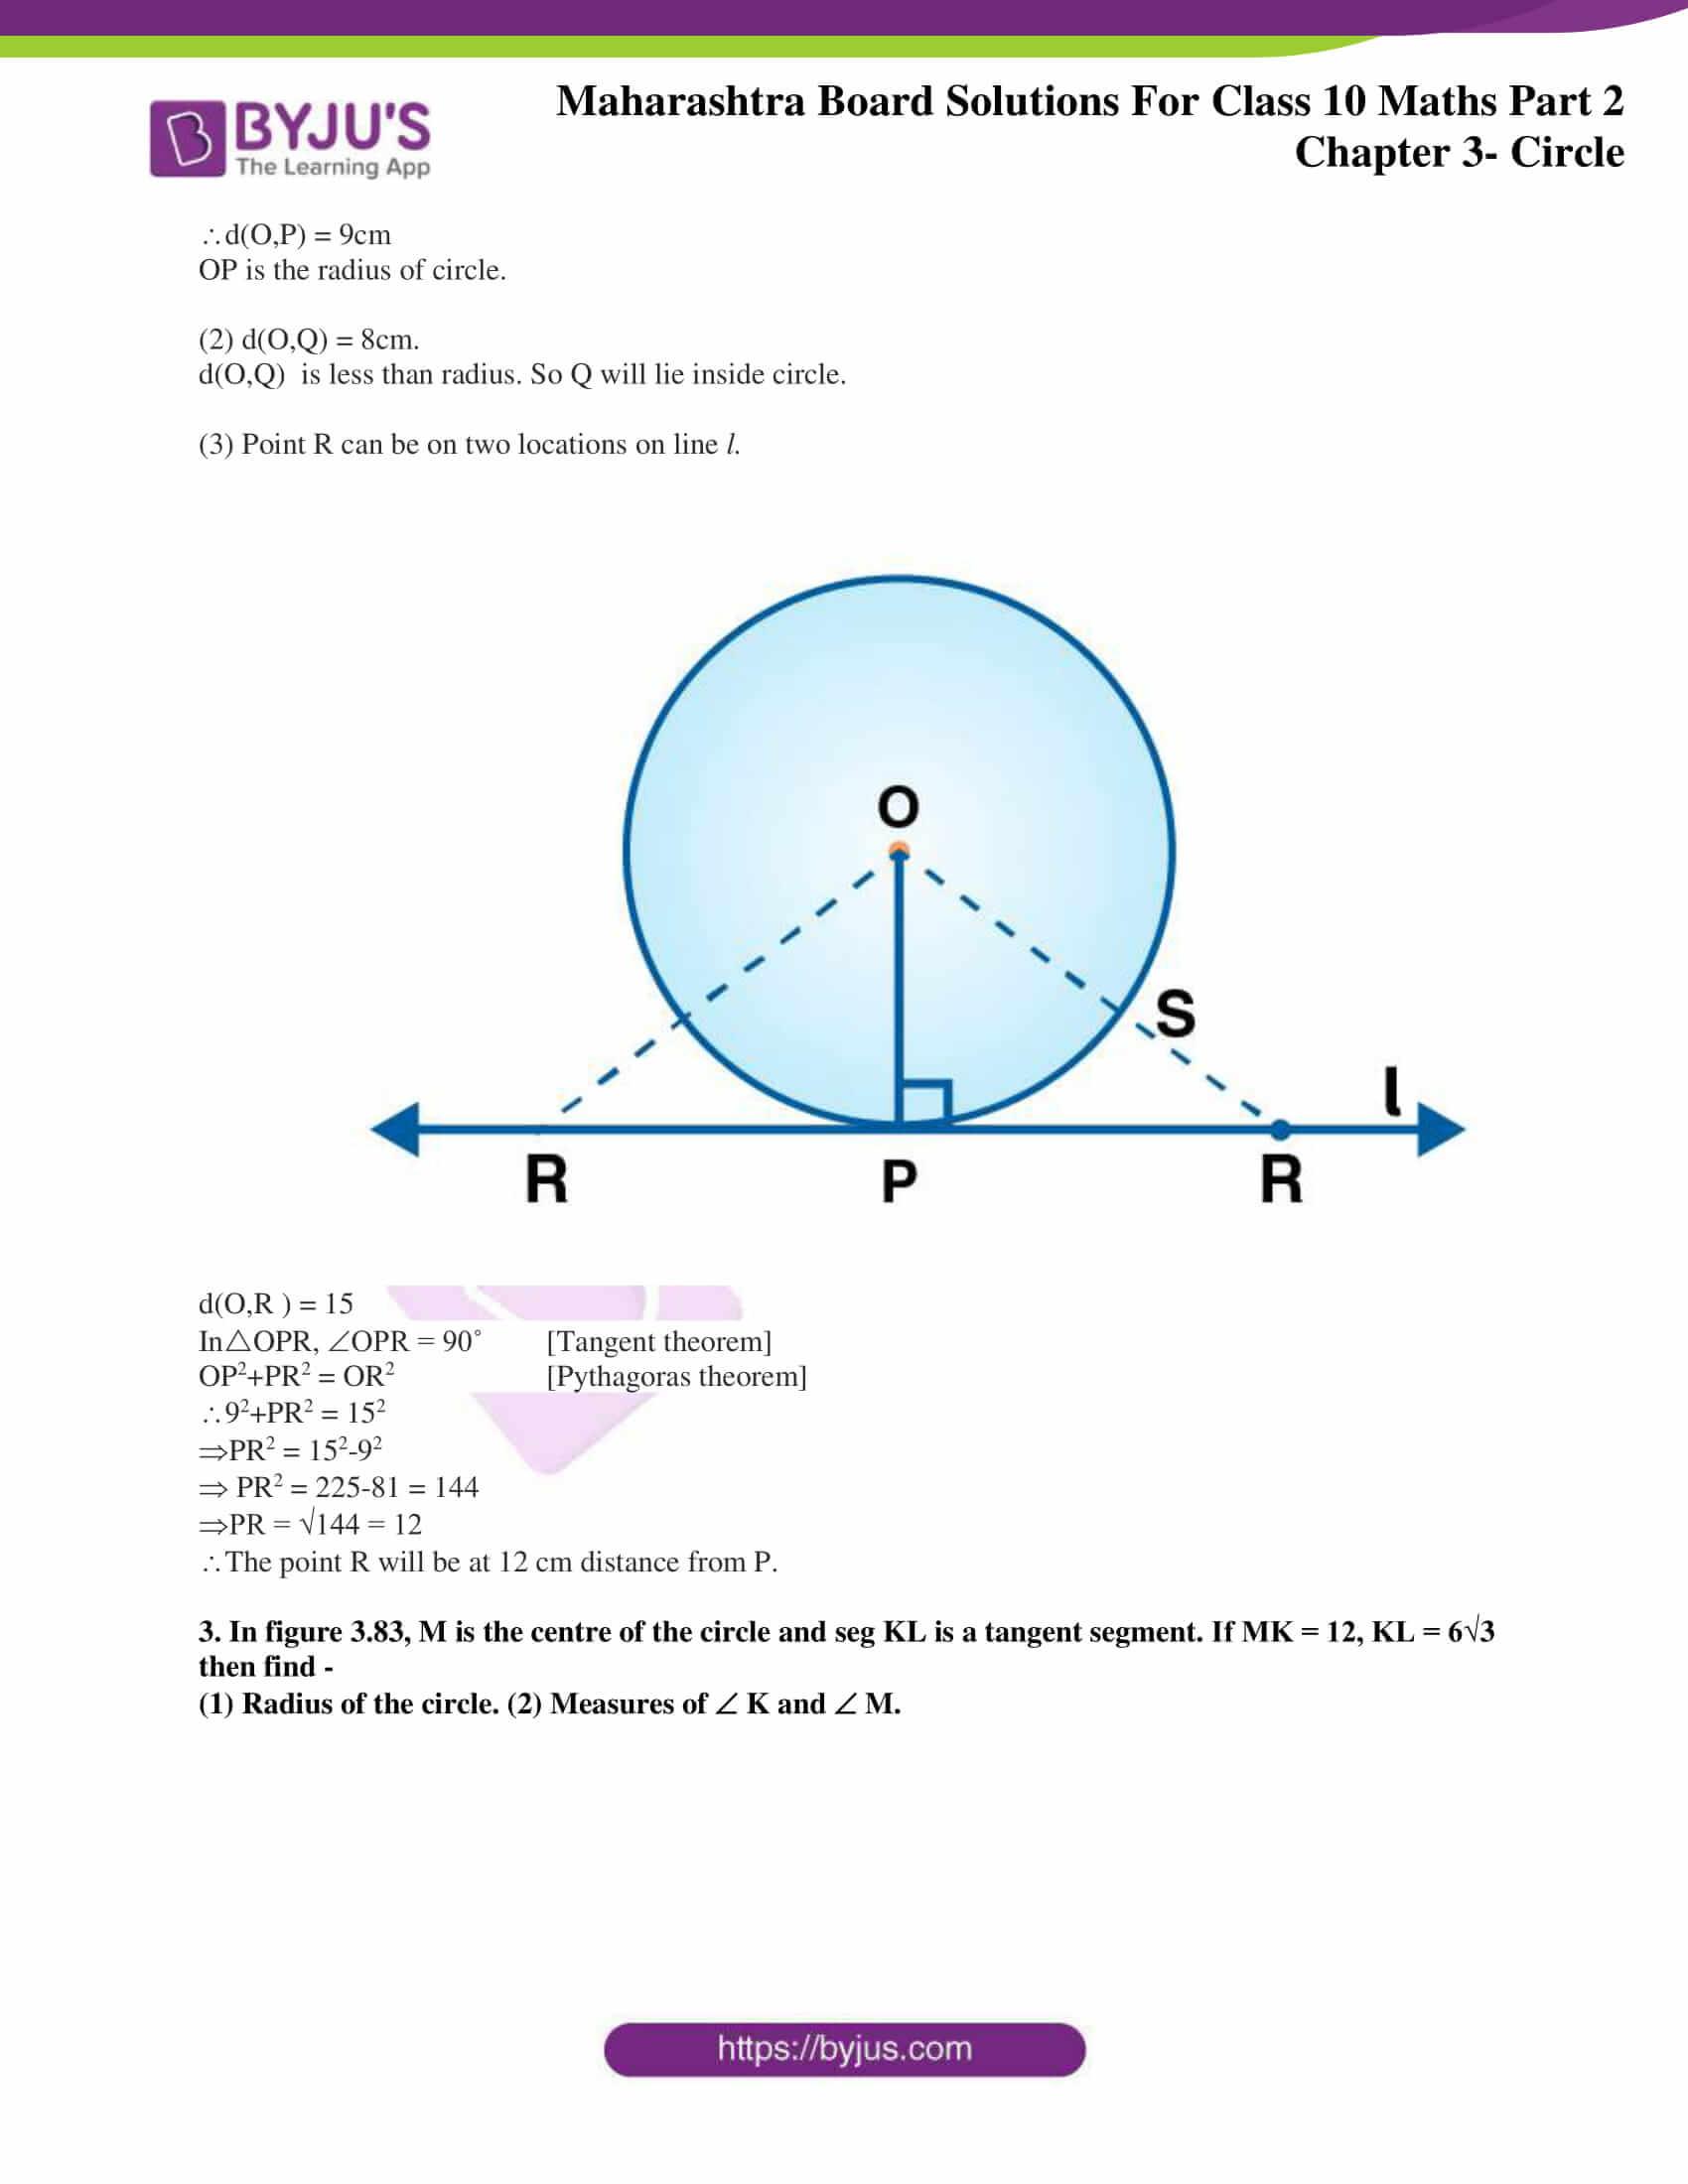 msbshse sol class 10 maths part 2 chapter 3 20